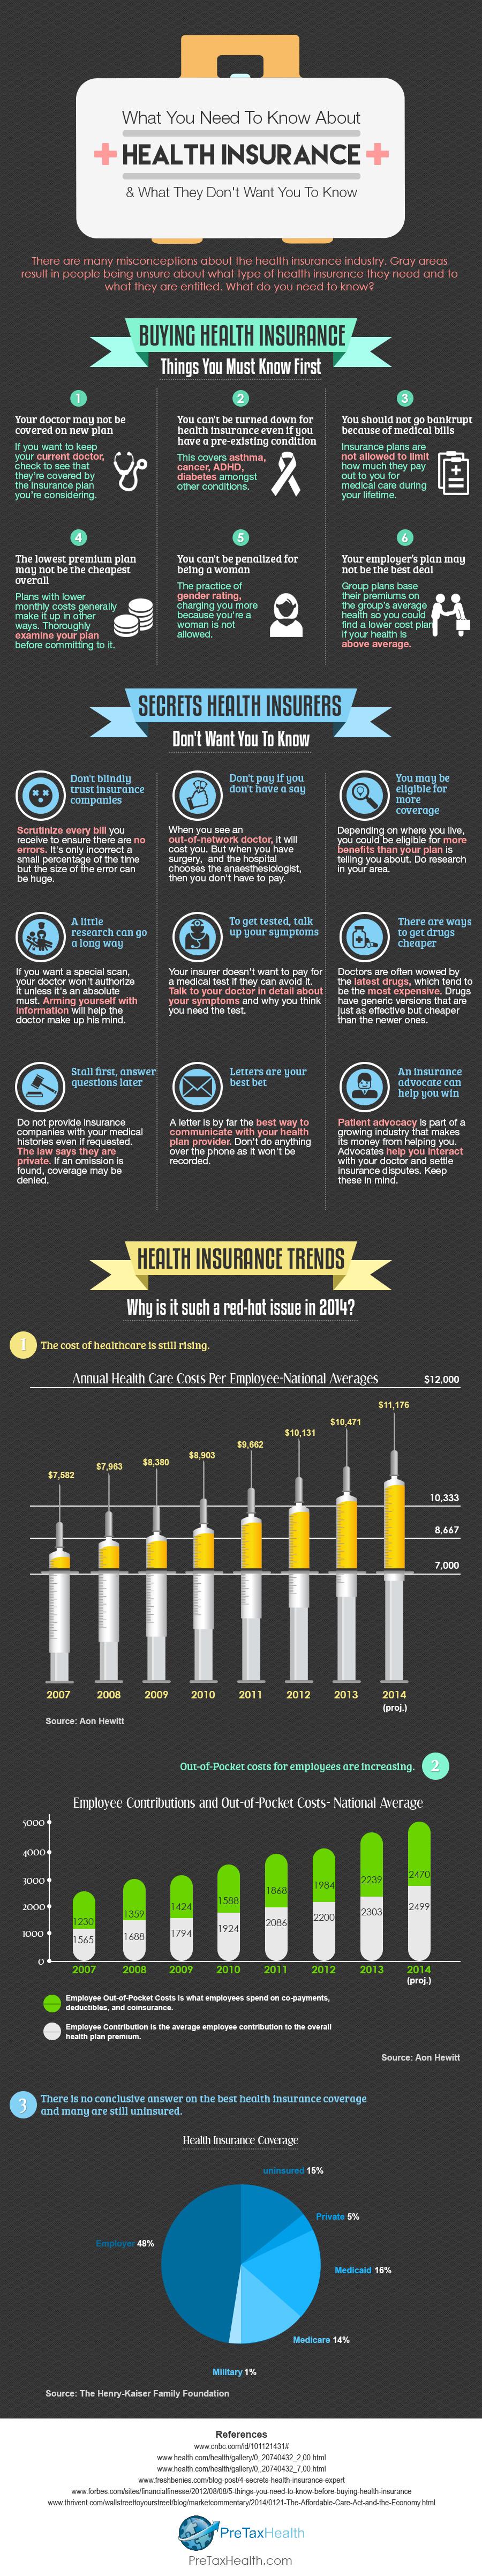 https://i2.wp.com/pretaxhealth.com/PreTax-Health-Infographic.jpg